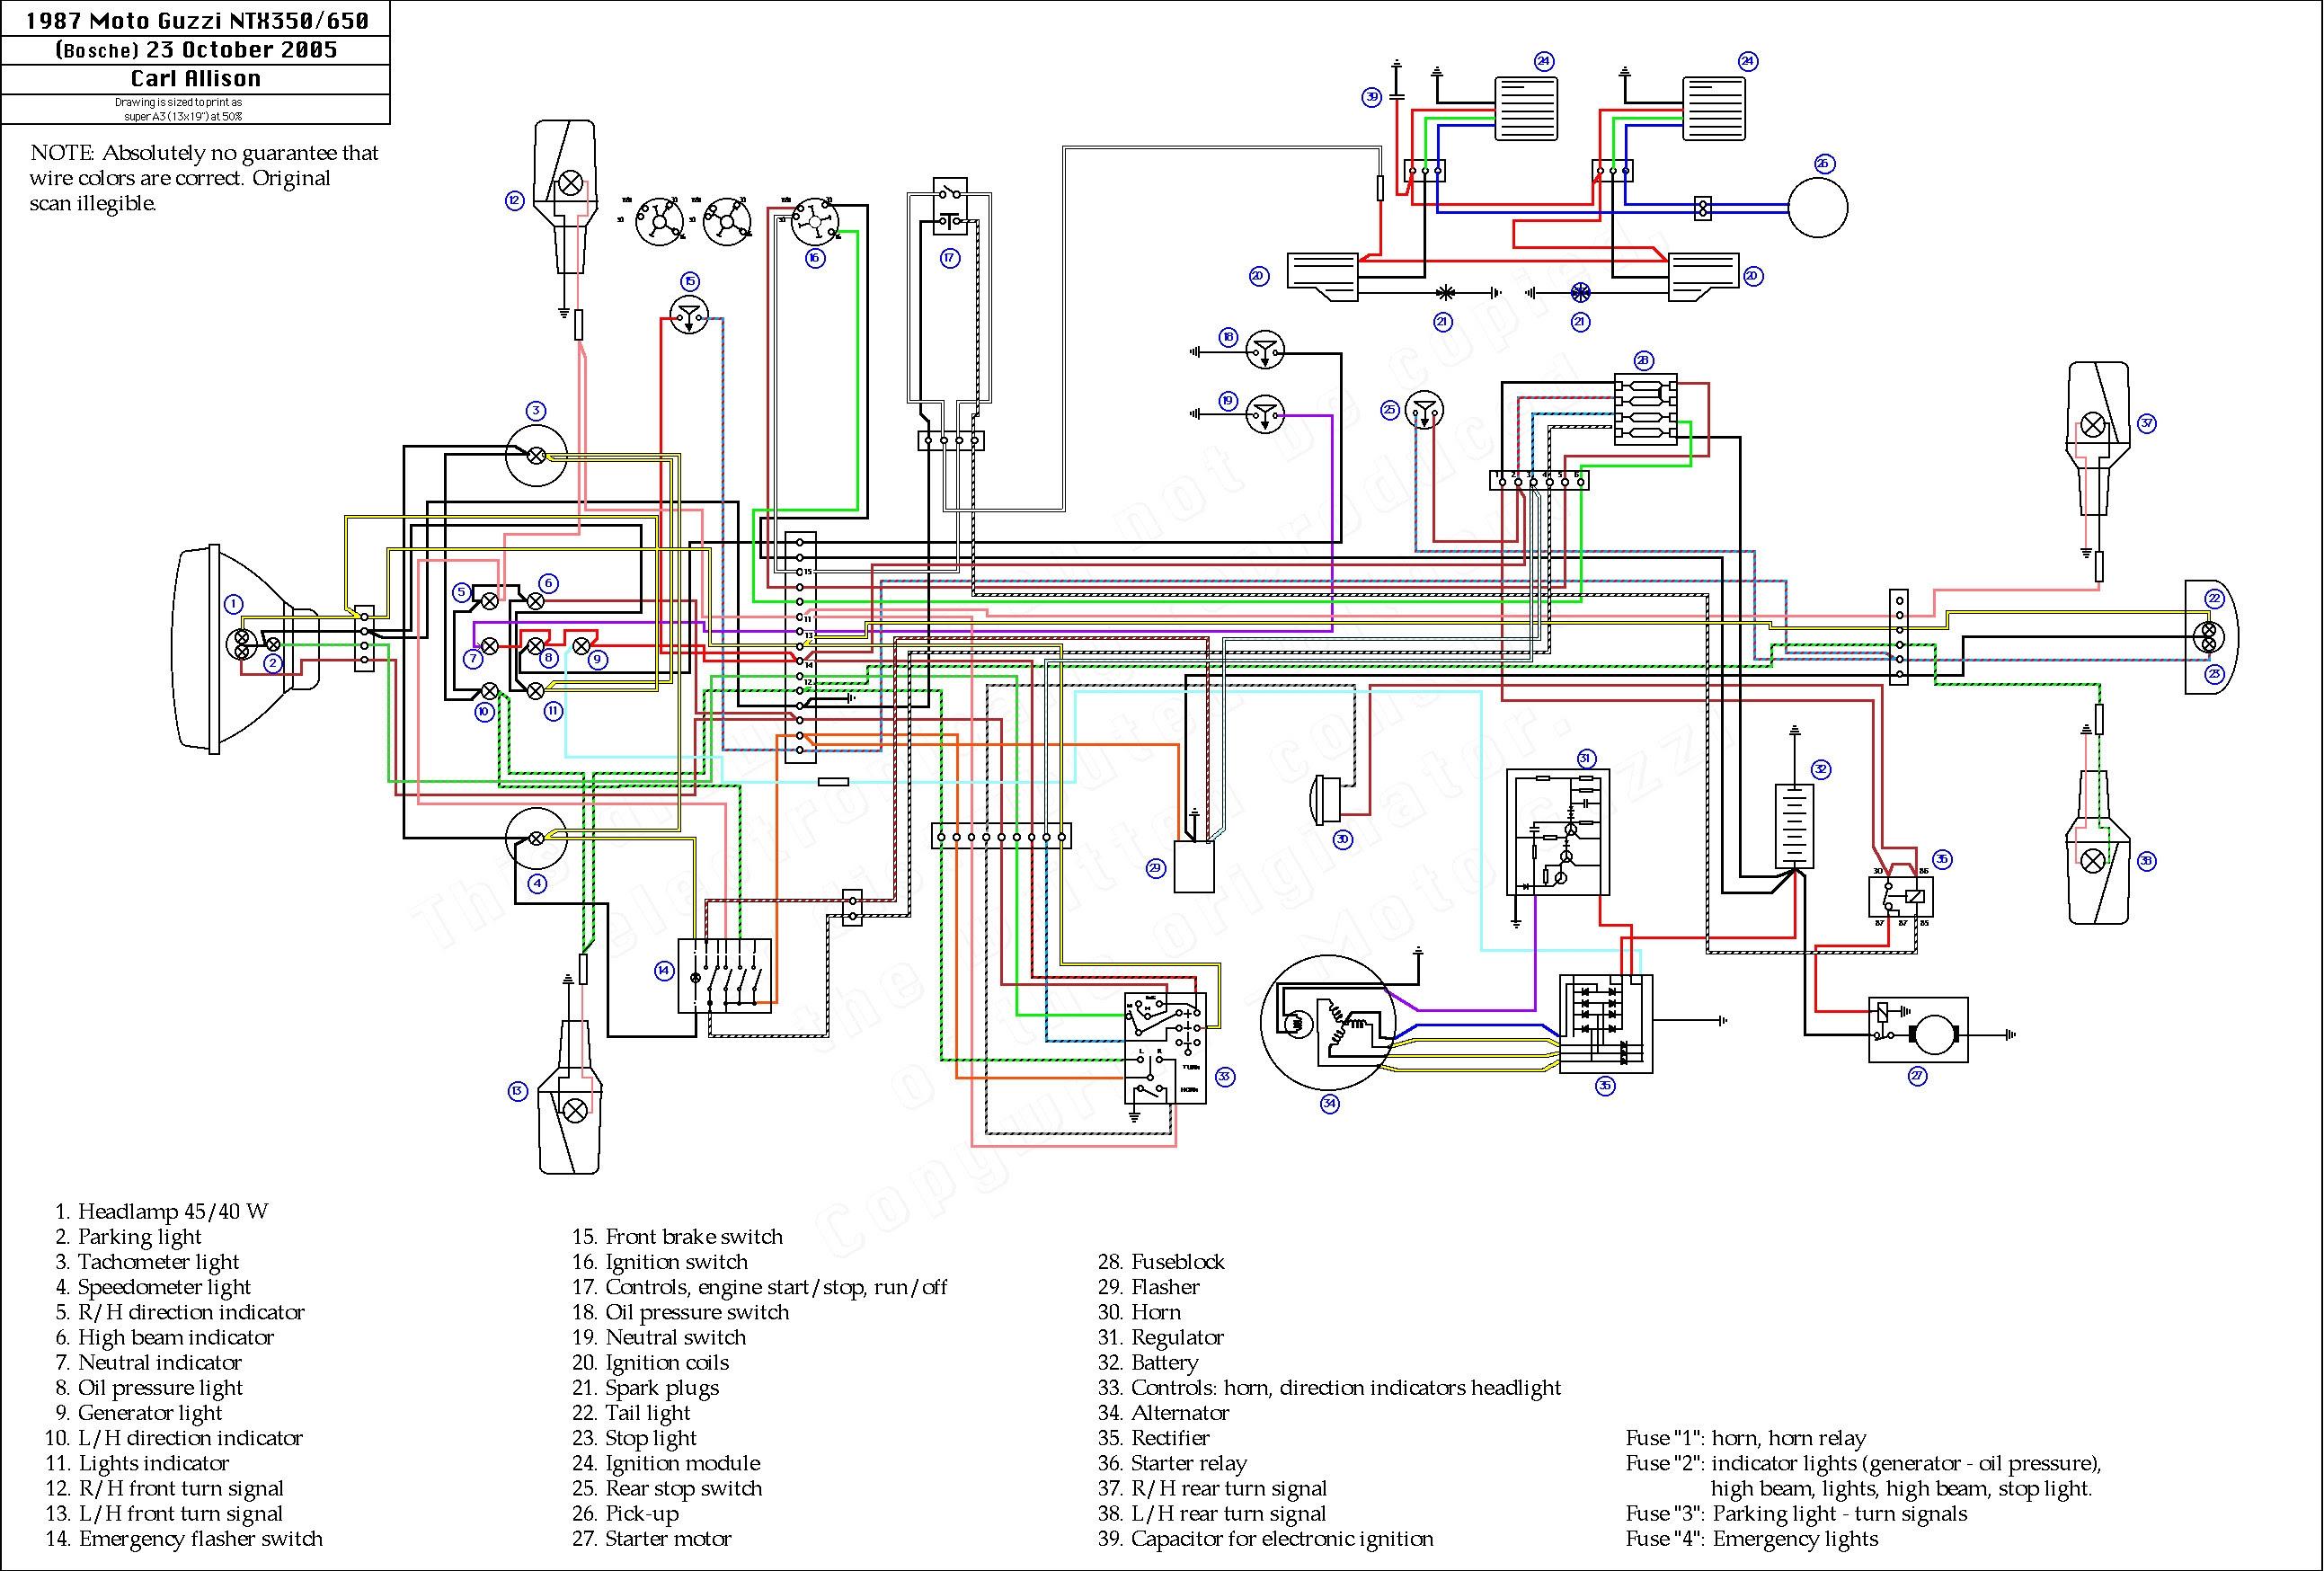 2003 Yamaha Warrior Wiring Diagrams Wiring Diagram Fix Fix Lechicchedimammavale It